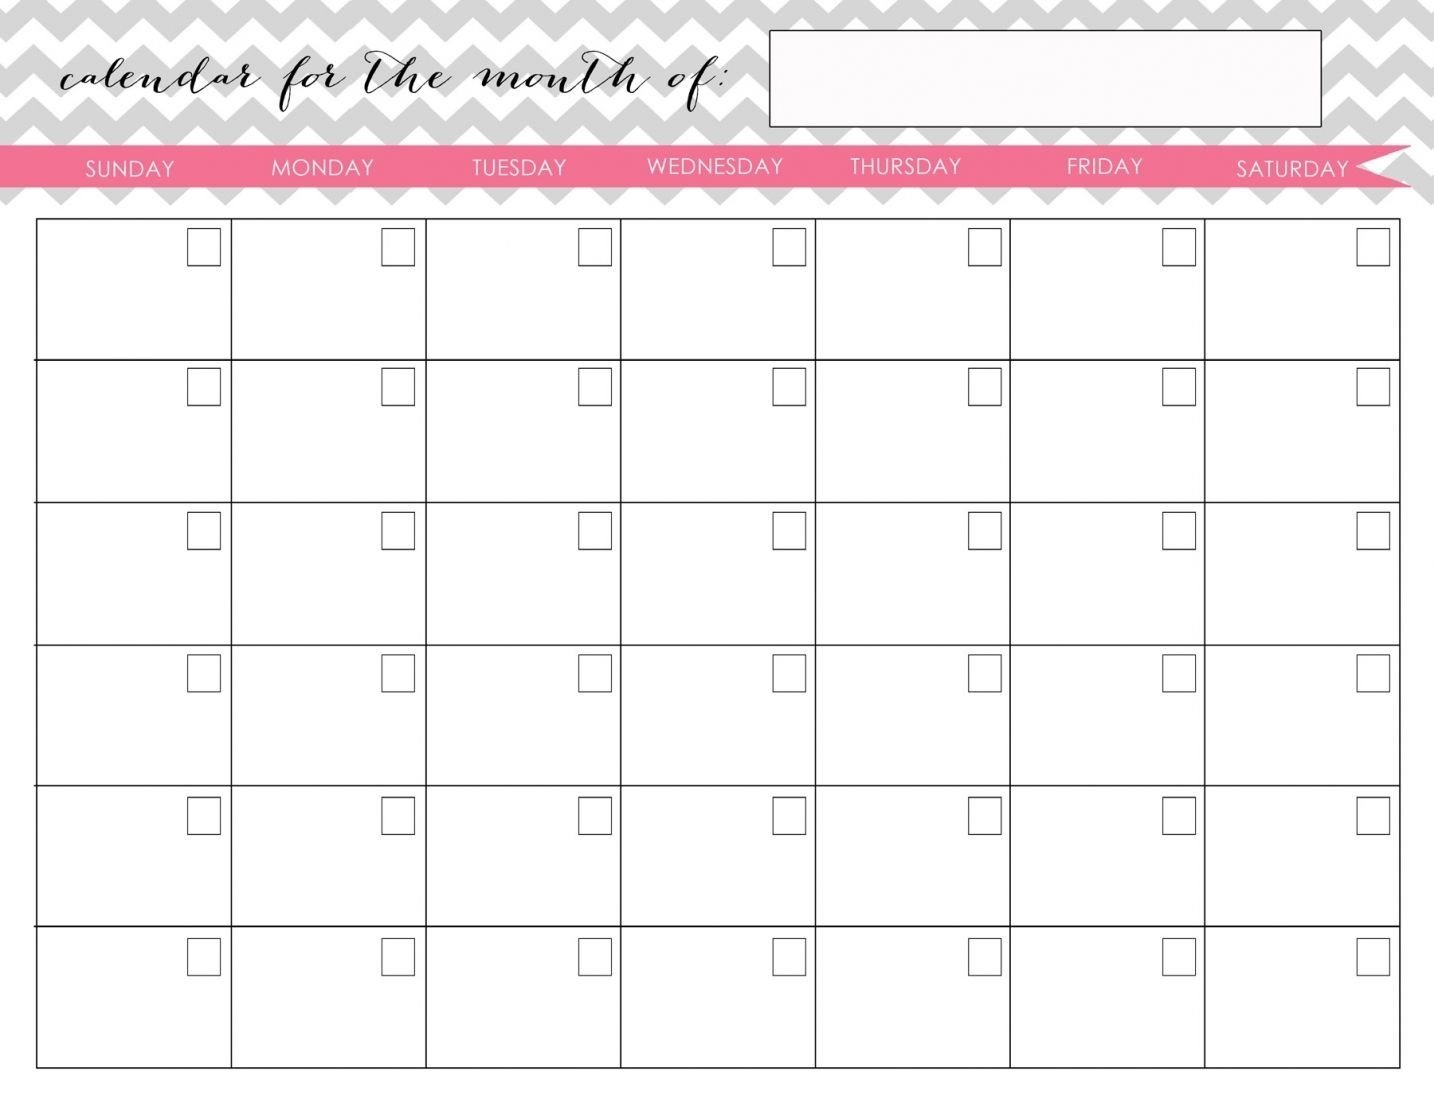 Printable Fill In Calendarmonth | Calendar Template Fill In Calendars To Print